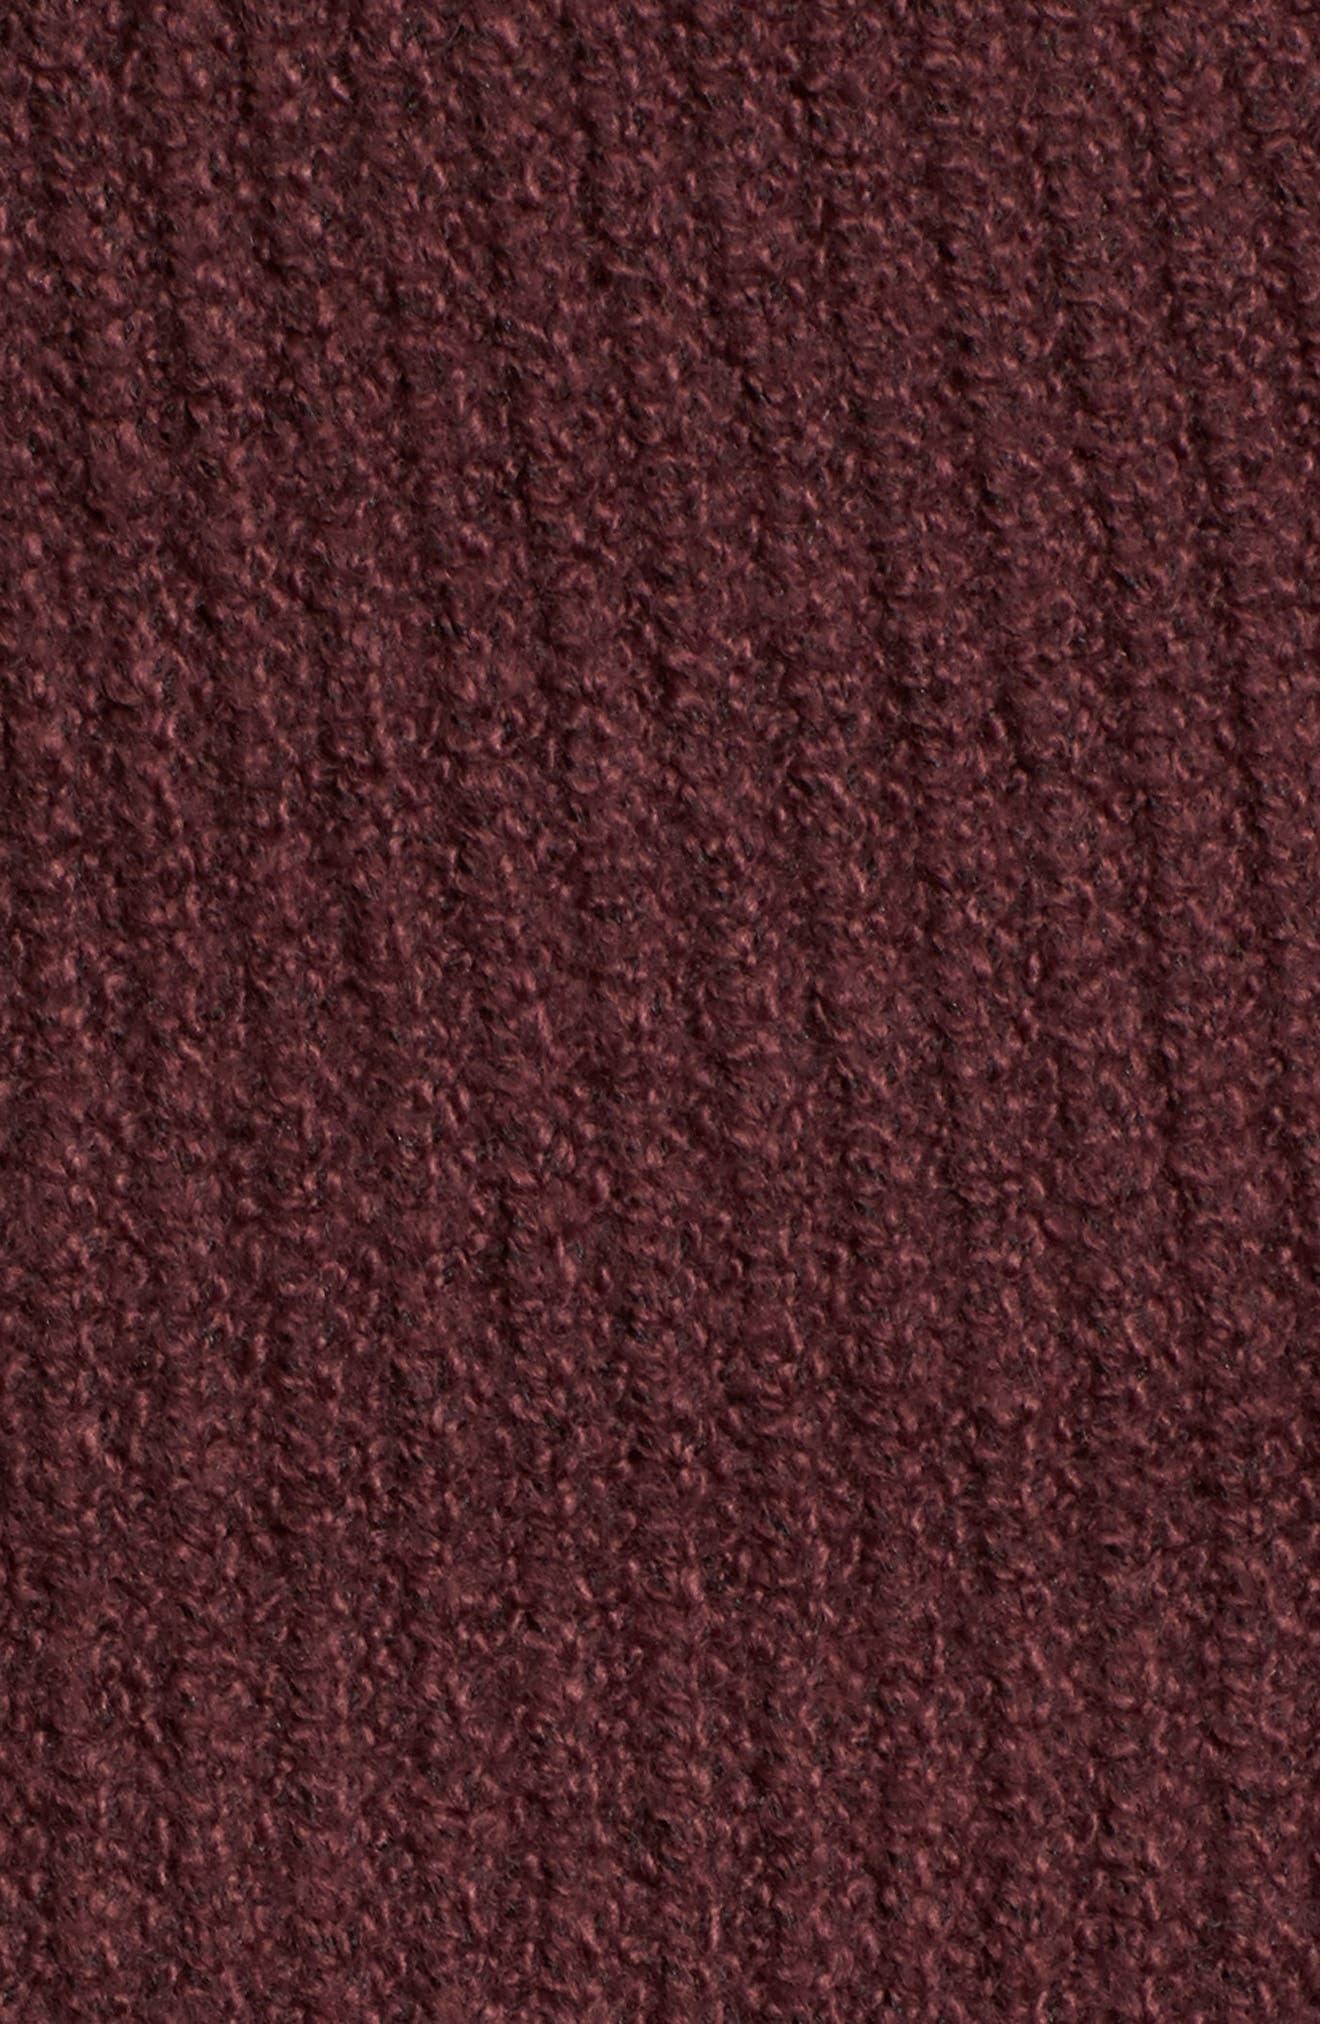 Ribbed Cardigan Sweater,                             Alternate thumbnail 5, color,                             Burgundy Fudge